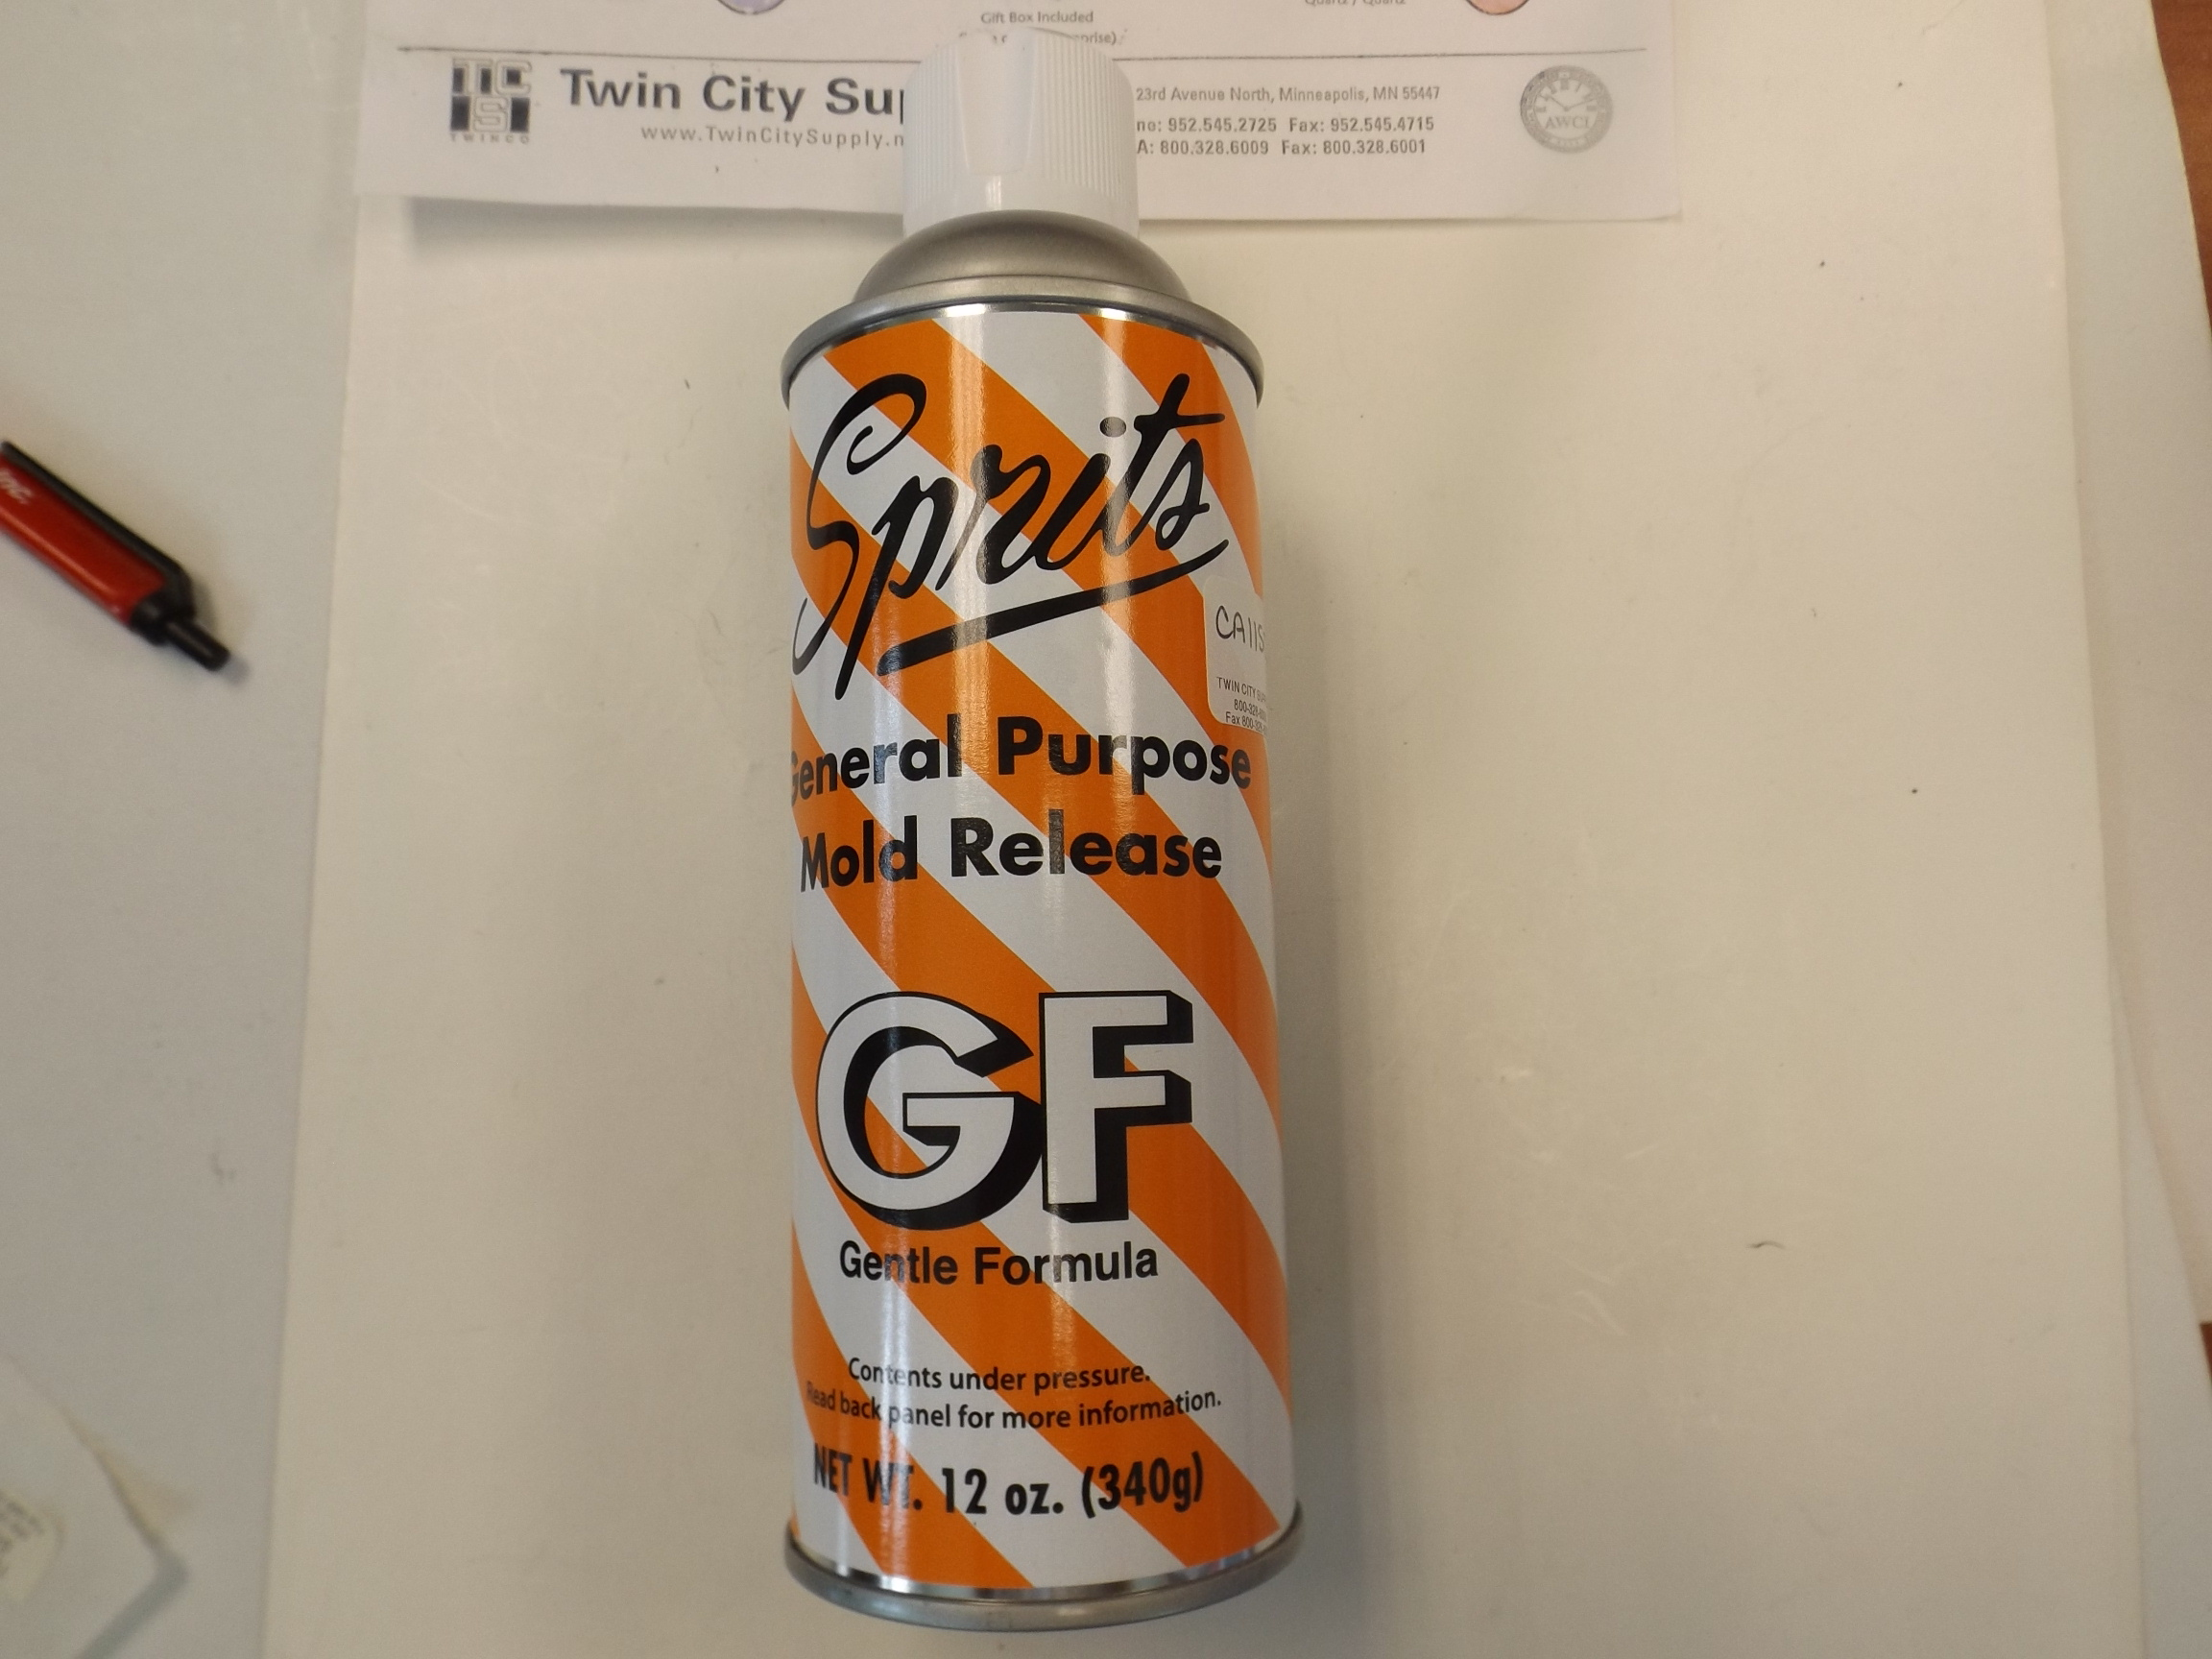 CA1150 New! Mold Release Spray, 12 oz. Spirit Brand- IKOHE #27-1715